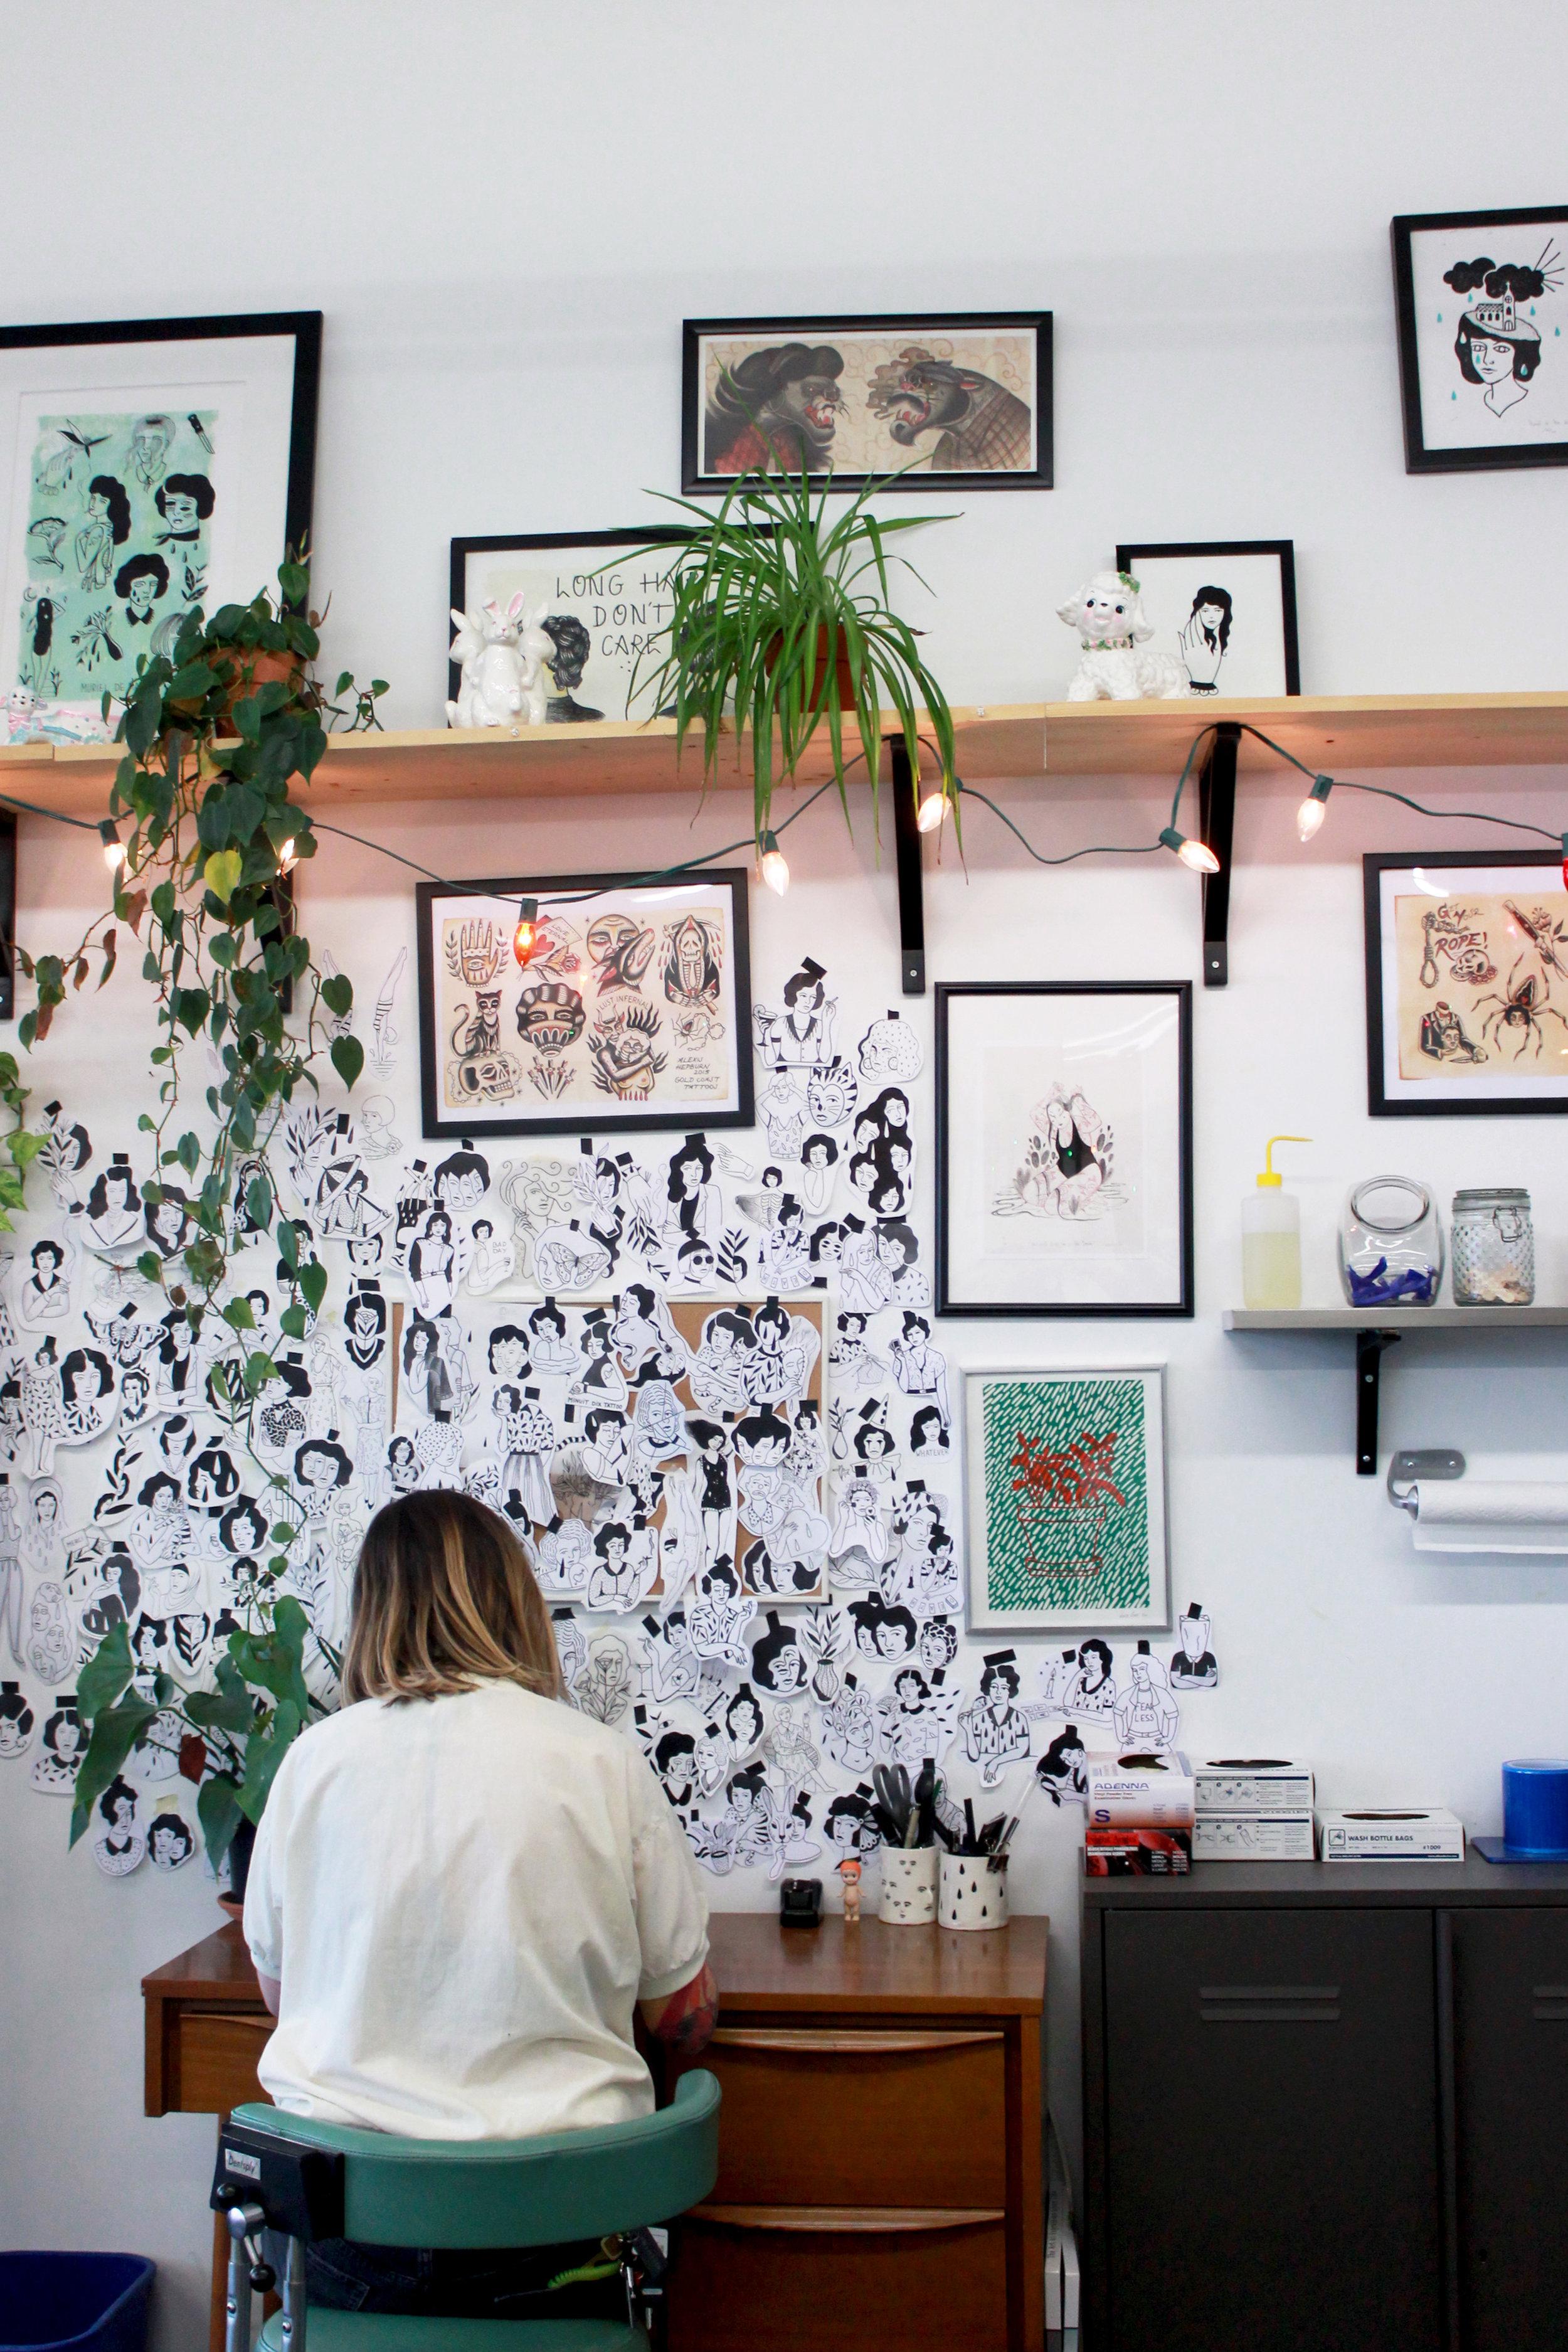 Minuit Dix: A Tattoo Studio Focused on Inclusivity and Respect -